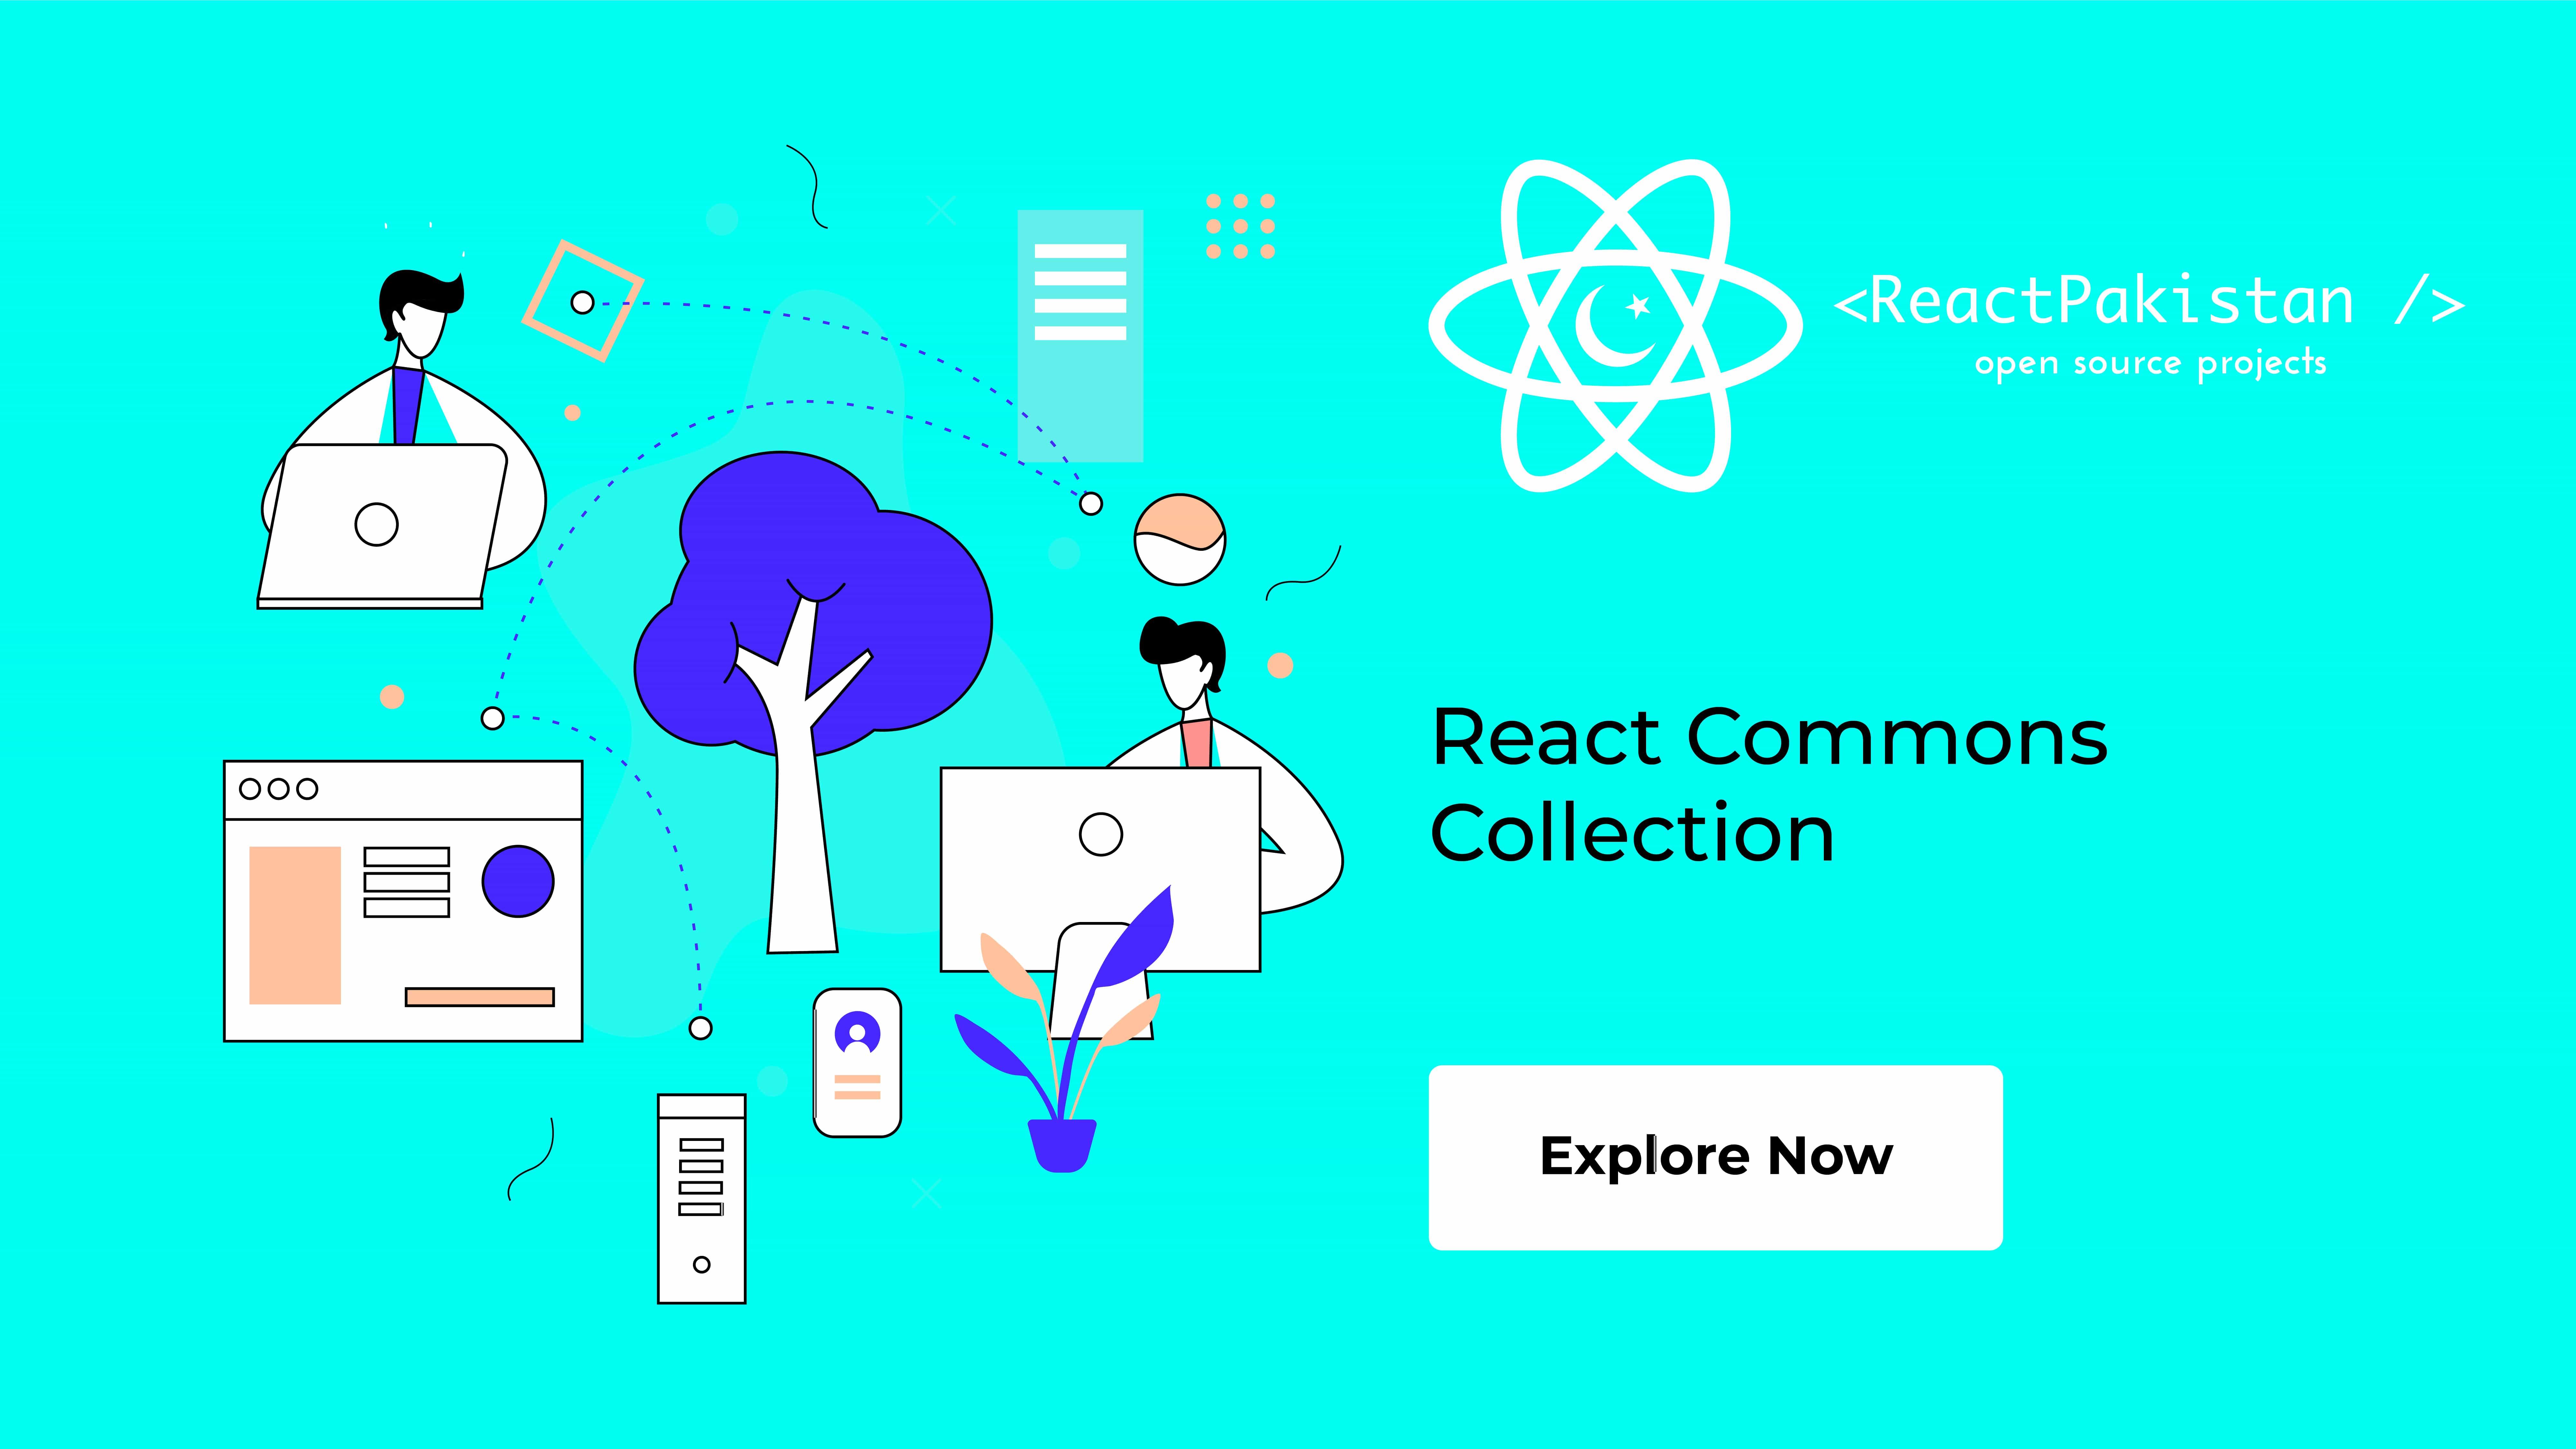 React Pakistan - React Commons Collection